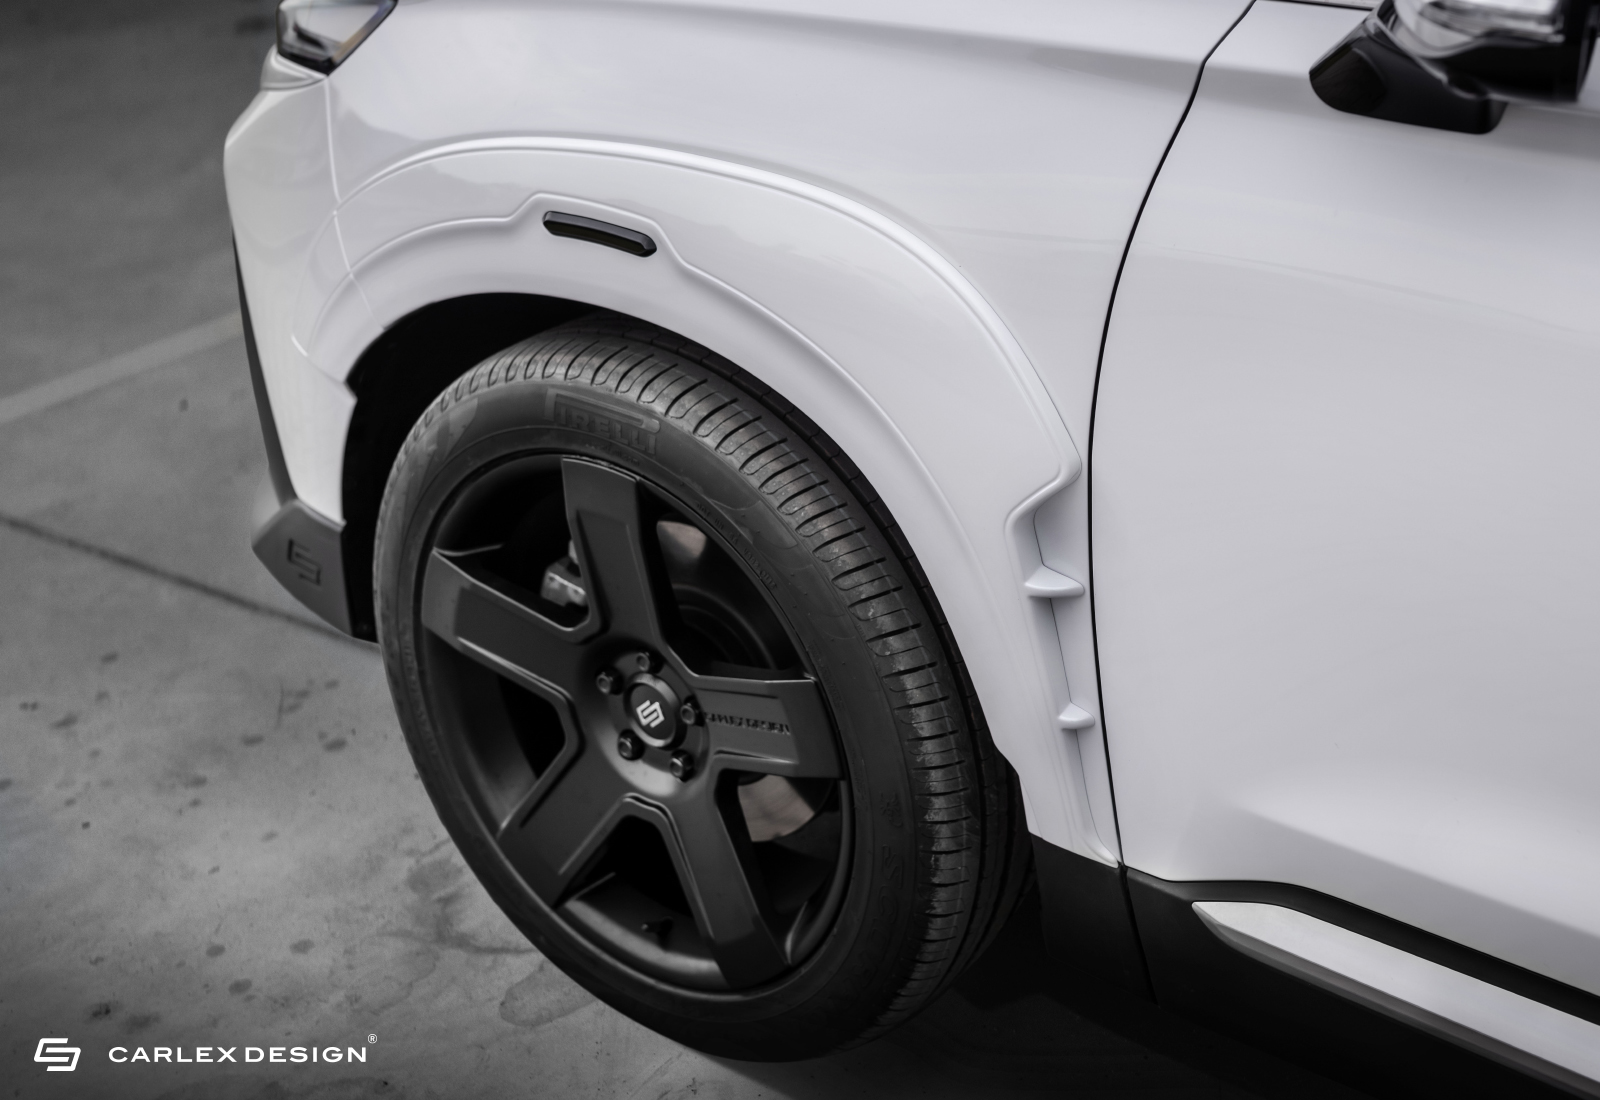 Hyundai-Santa-Fe-by-Carlex-Design-7